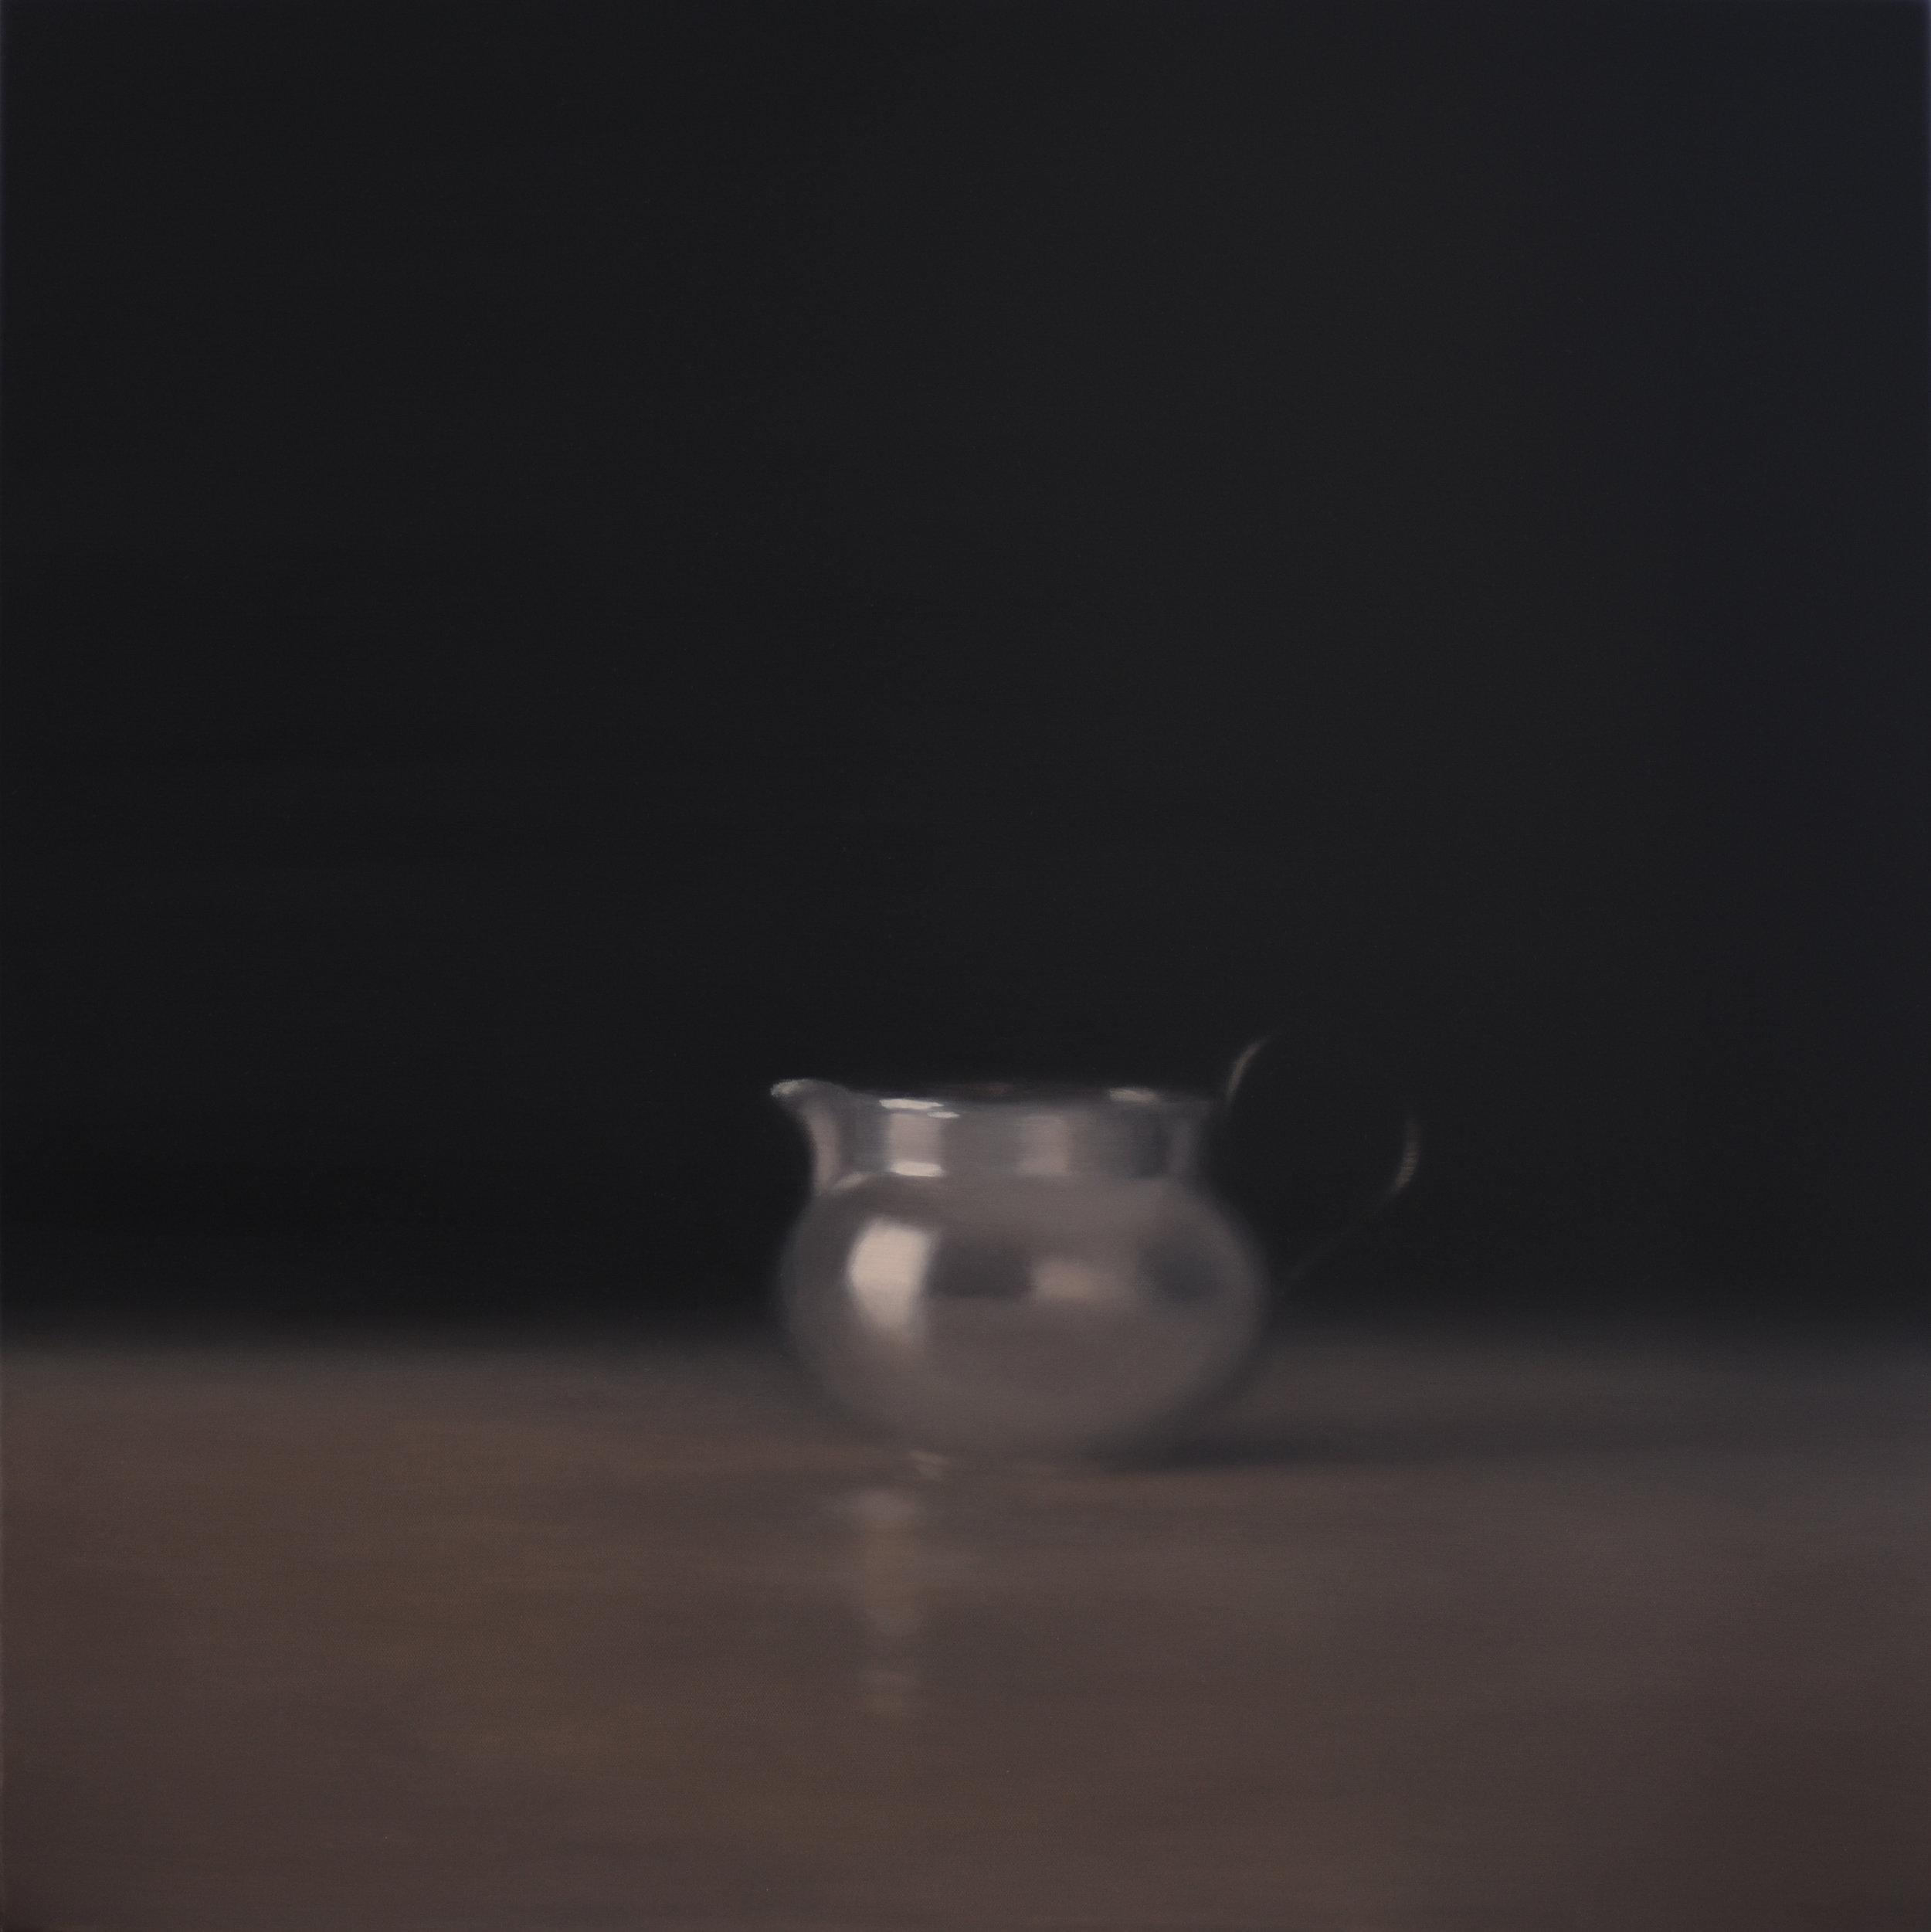 Artist: Harriet Porter  Title: Dissolve  Size: 93cm x 93cm  Medium: oil on canvas  Price: £2950  SOLD